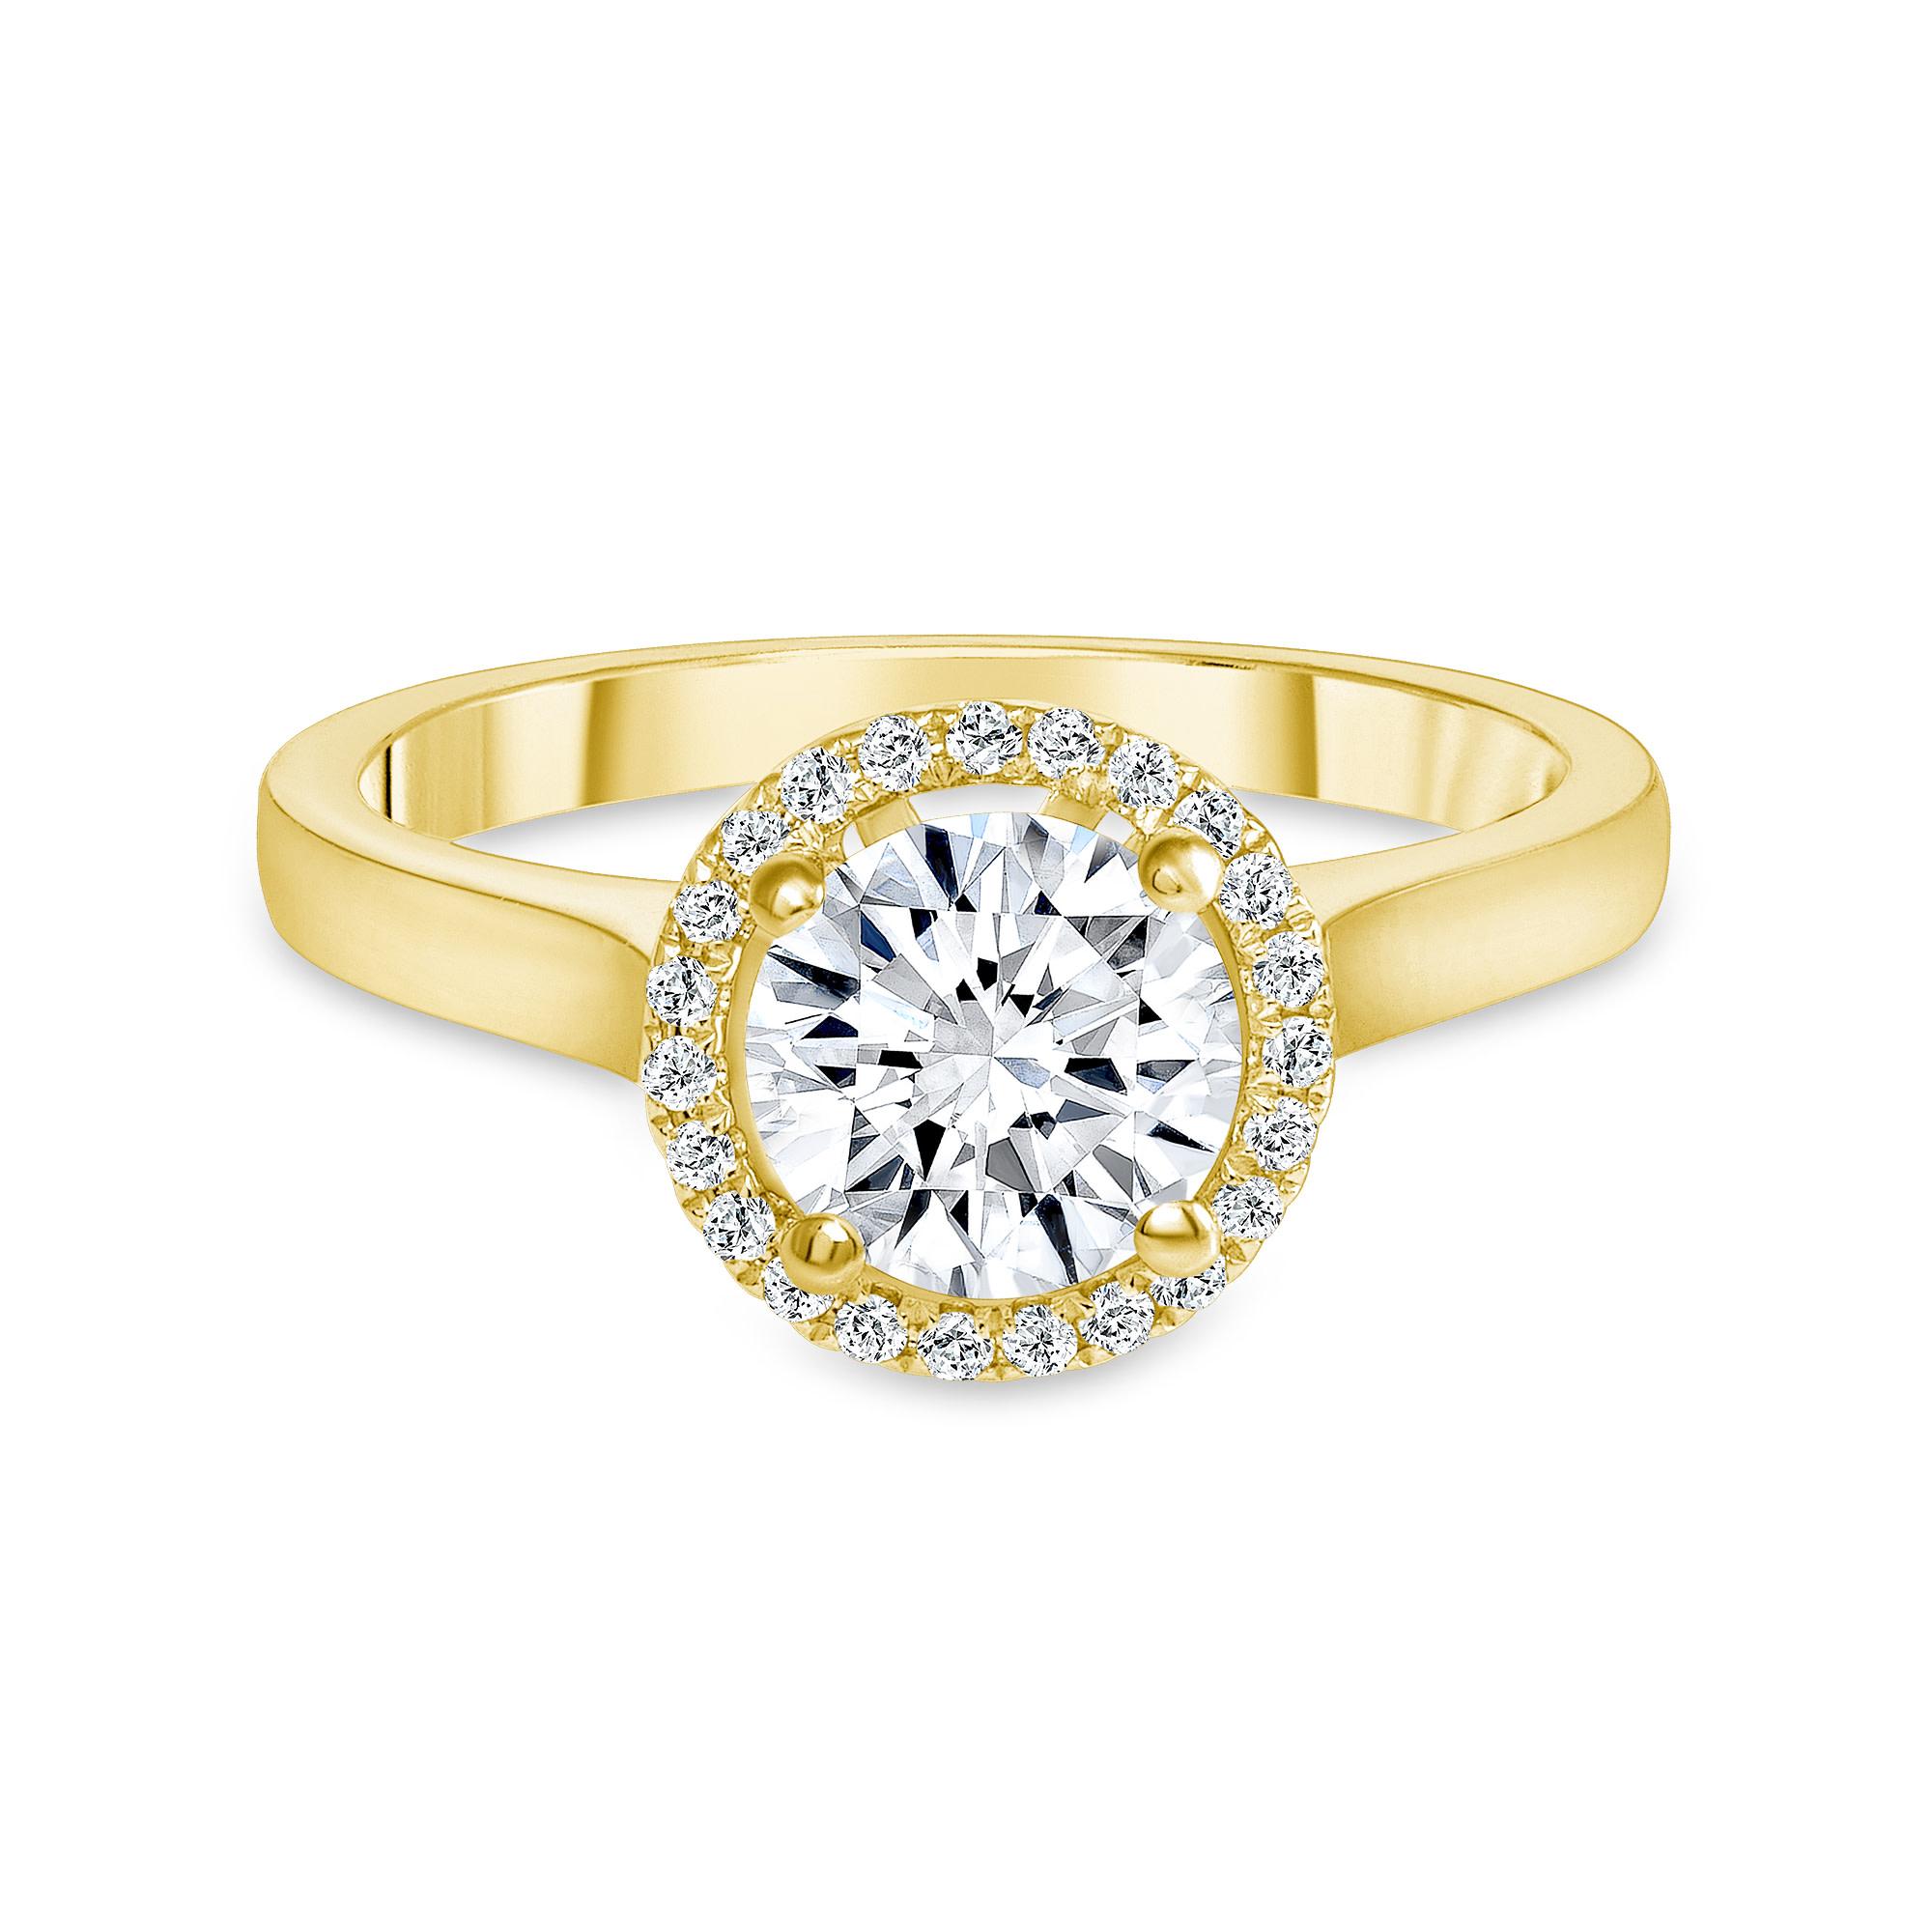 14k diamond ring white gold | 1 ct diamond engagement ring 14k white gold